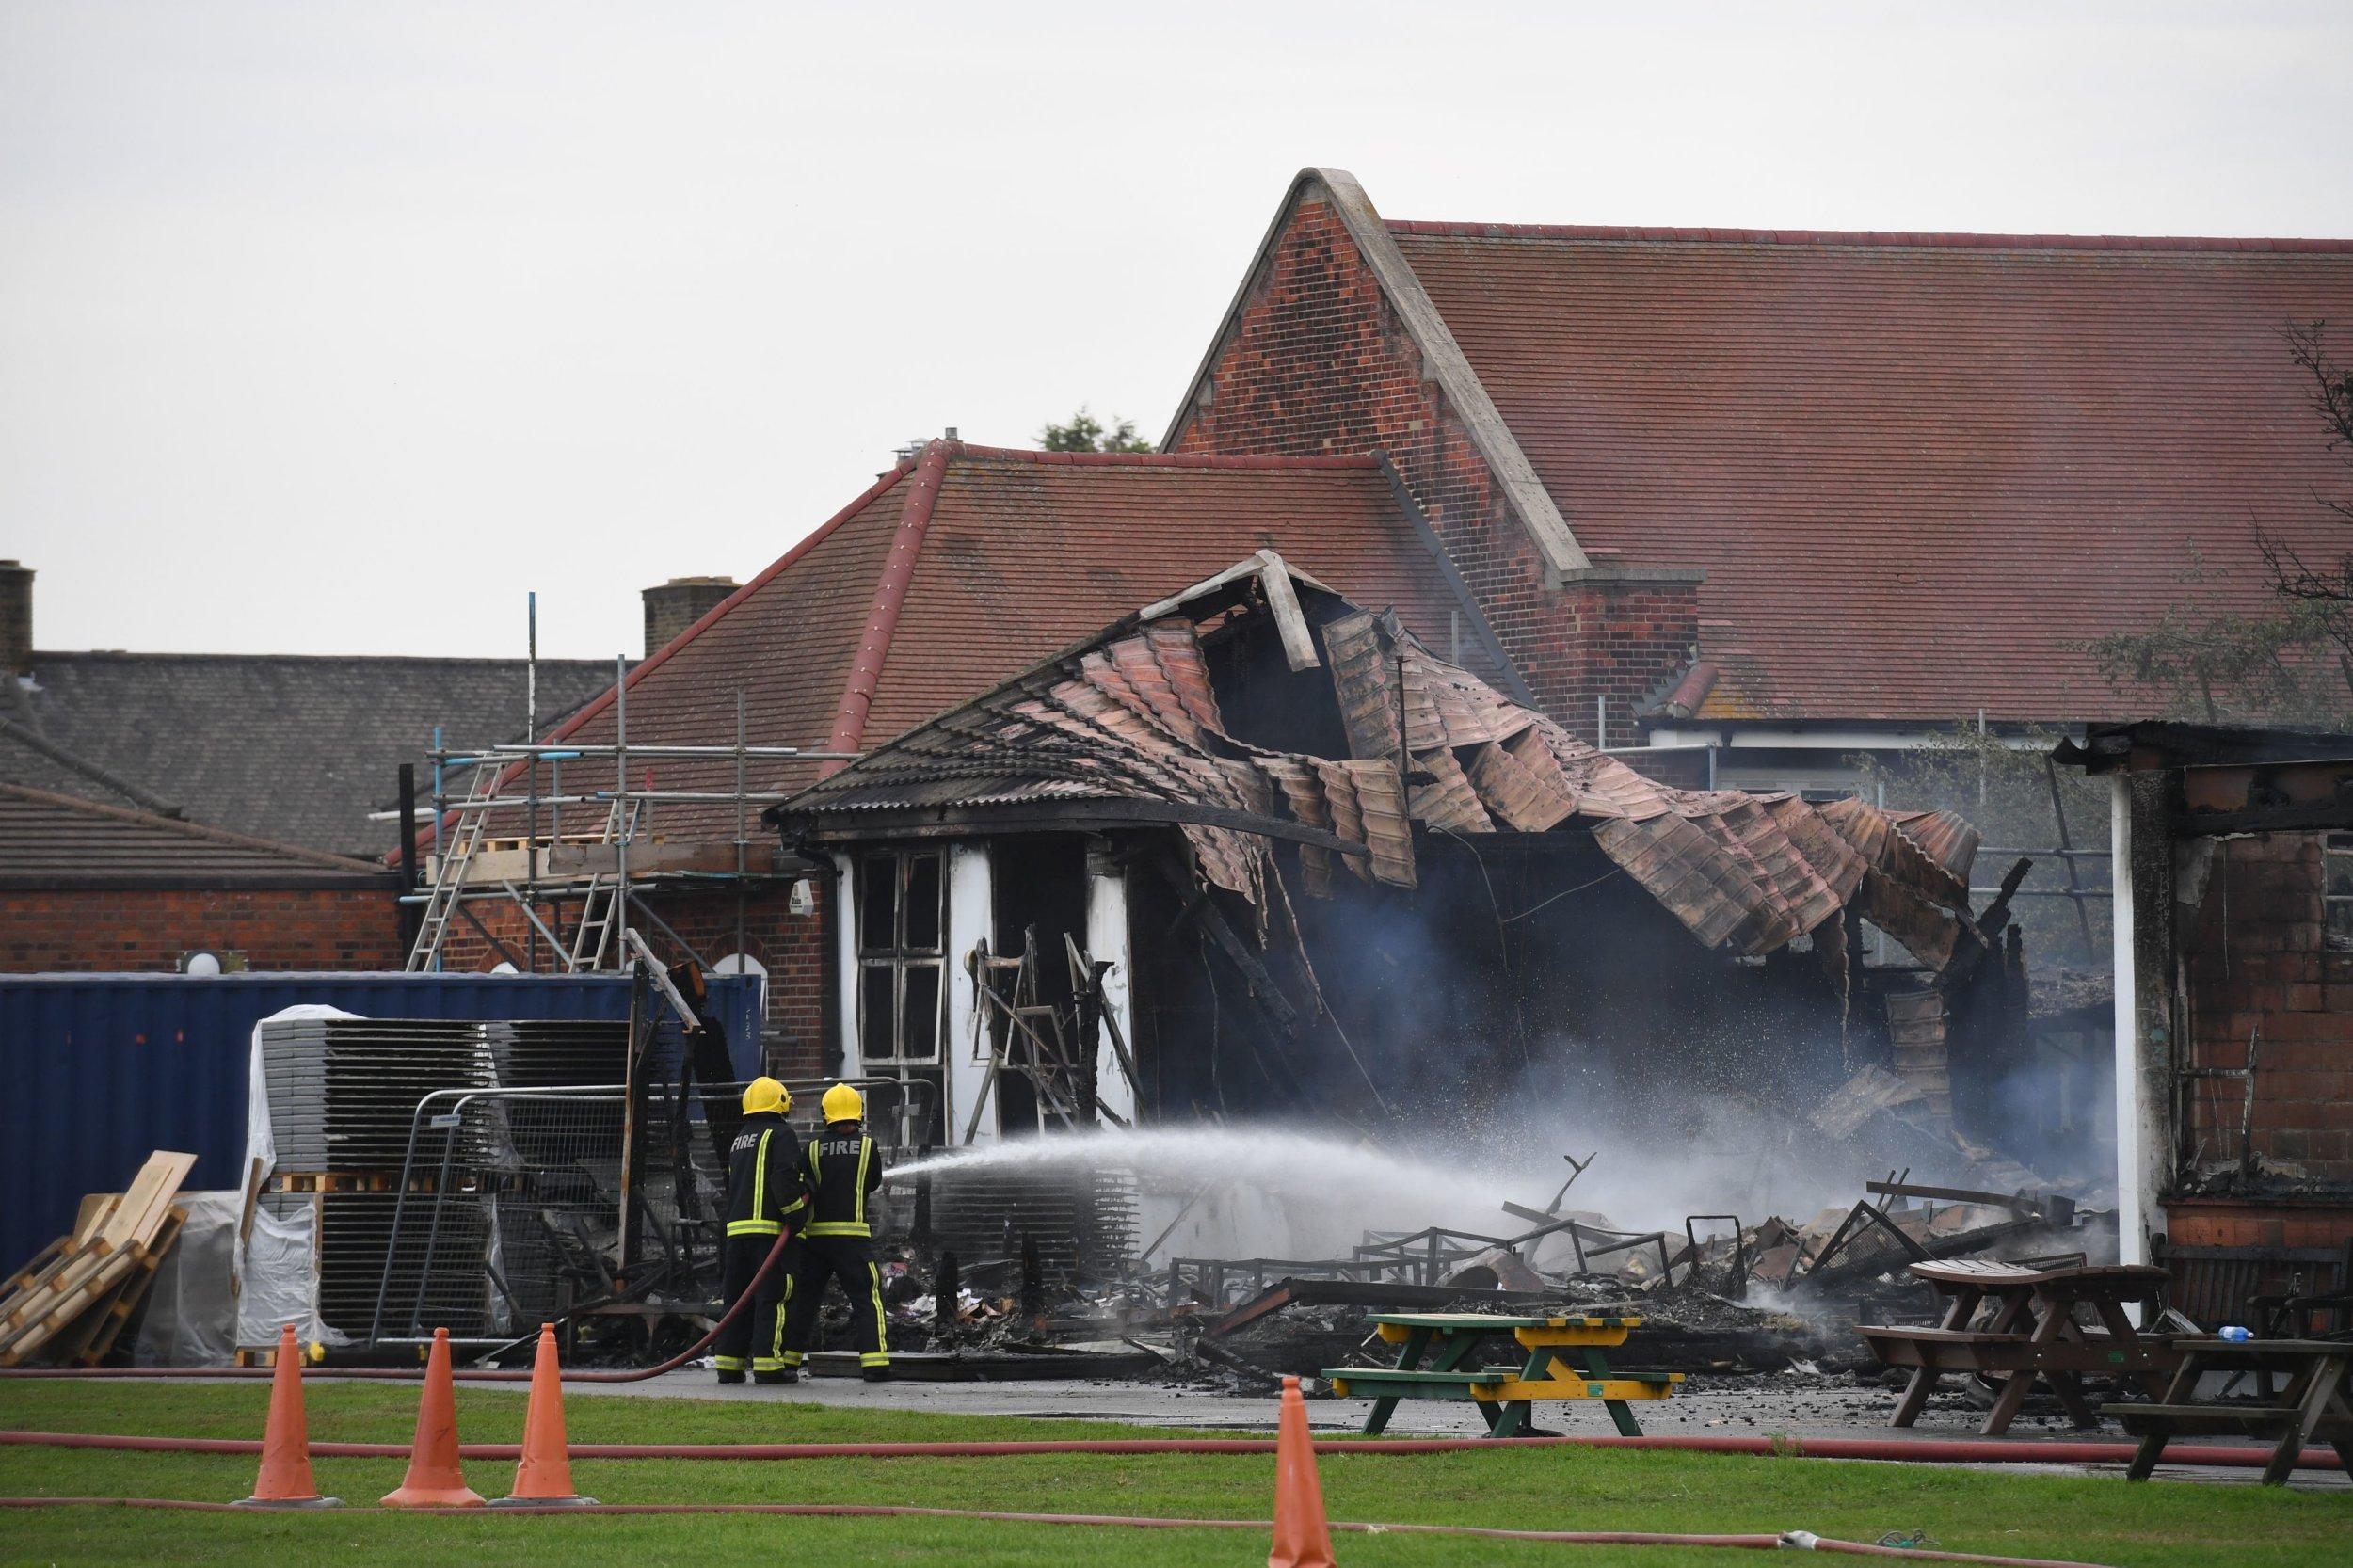 Huge fire breaks out at Roding primary school in Dagenham day before children go back